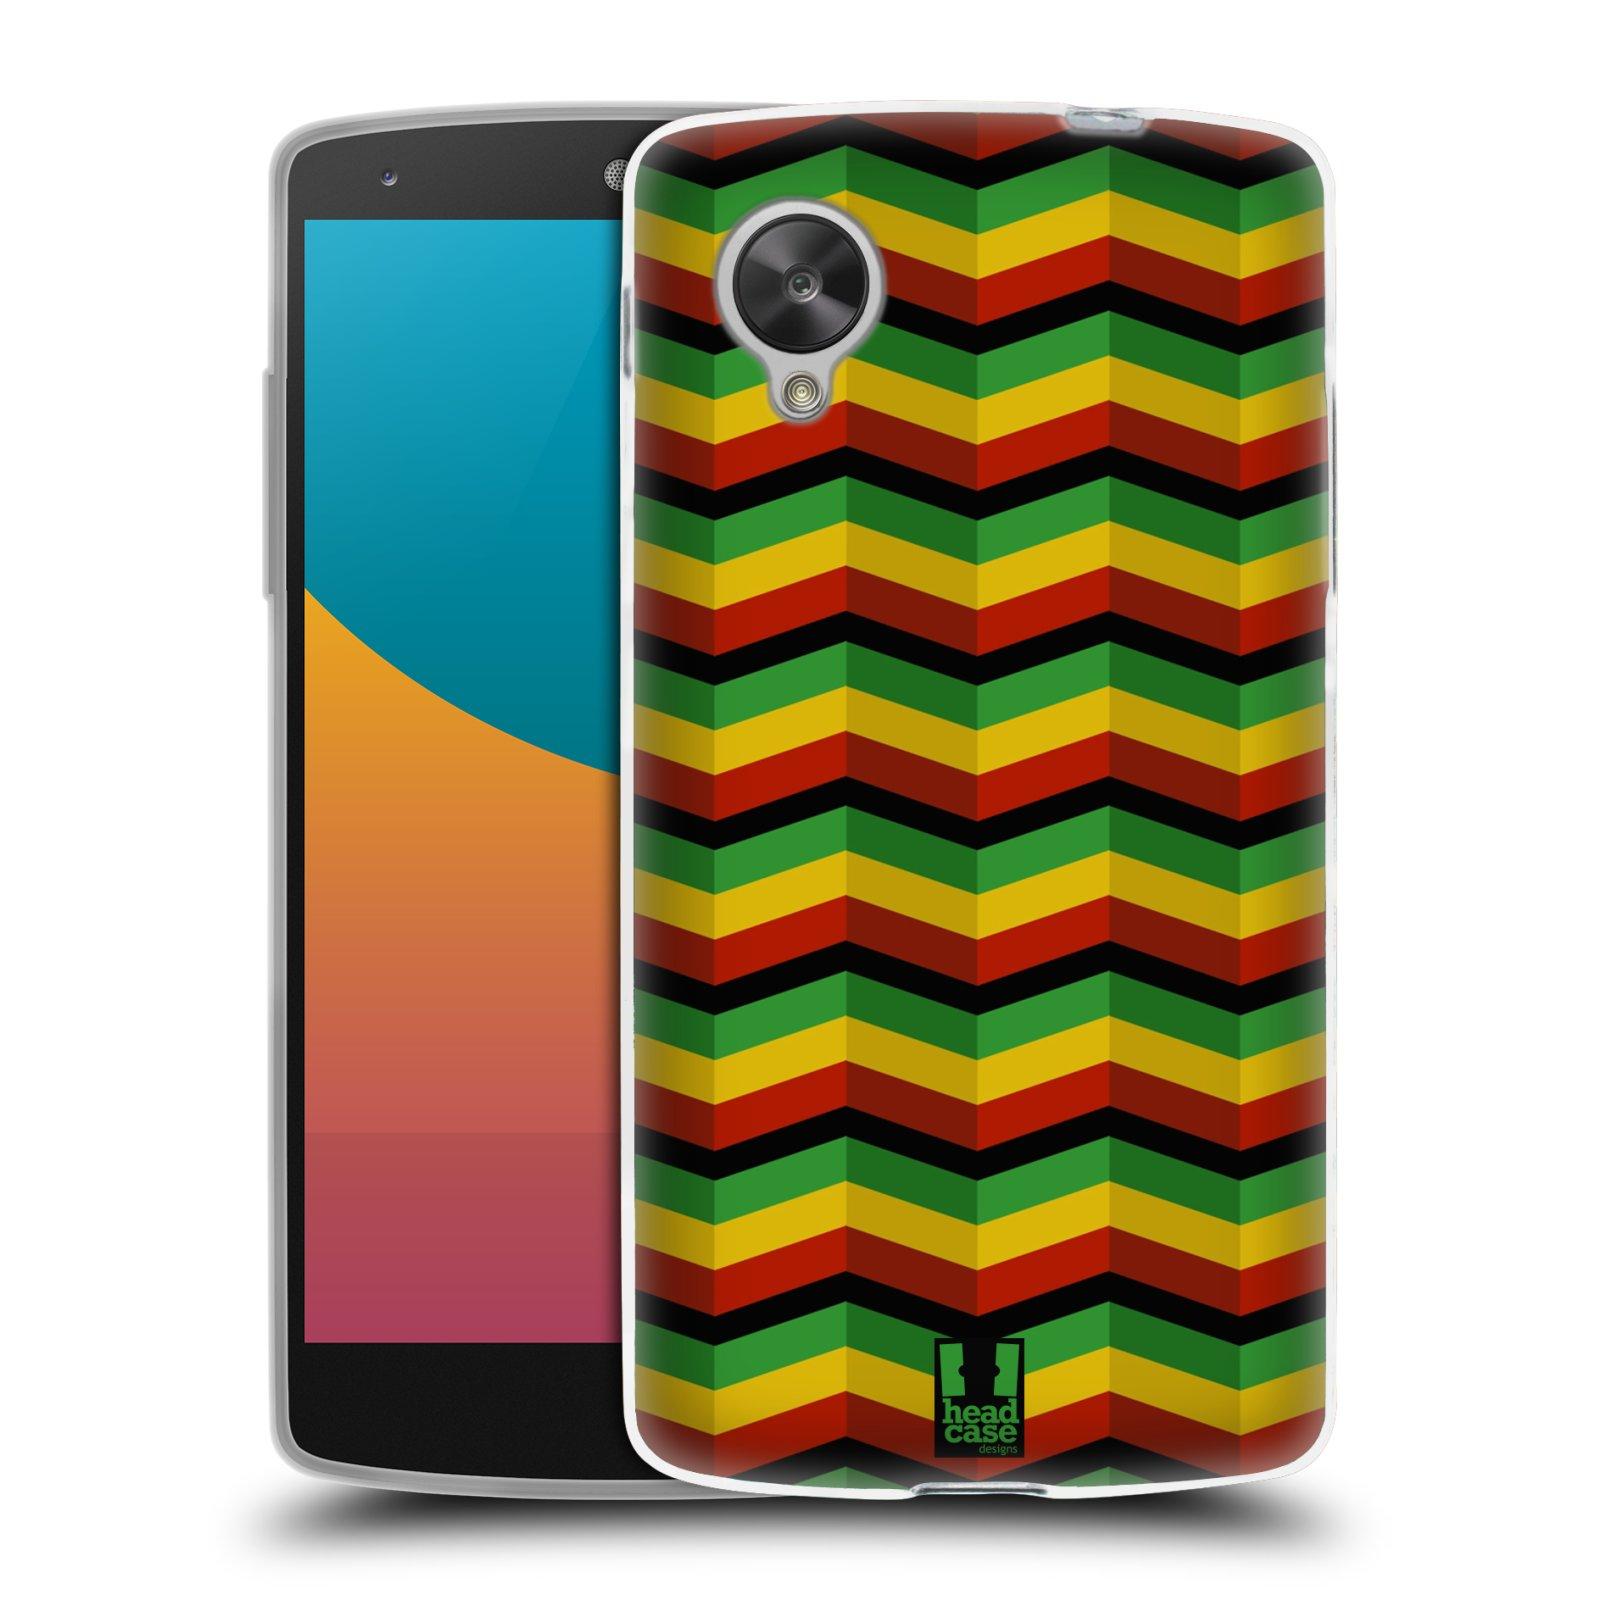 Silikonové pouzdro na mobil LG Nexus 5 HEAD CASE RASTA CHEVRON (Silikonový kryt či obal na mobilní telefon LG Google Nexus 5 D821)